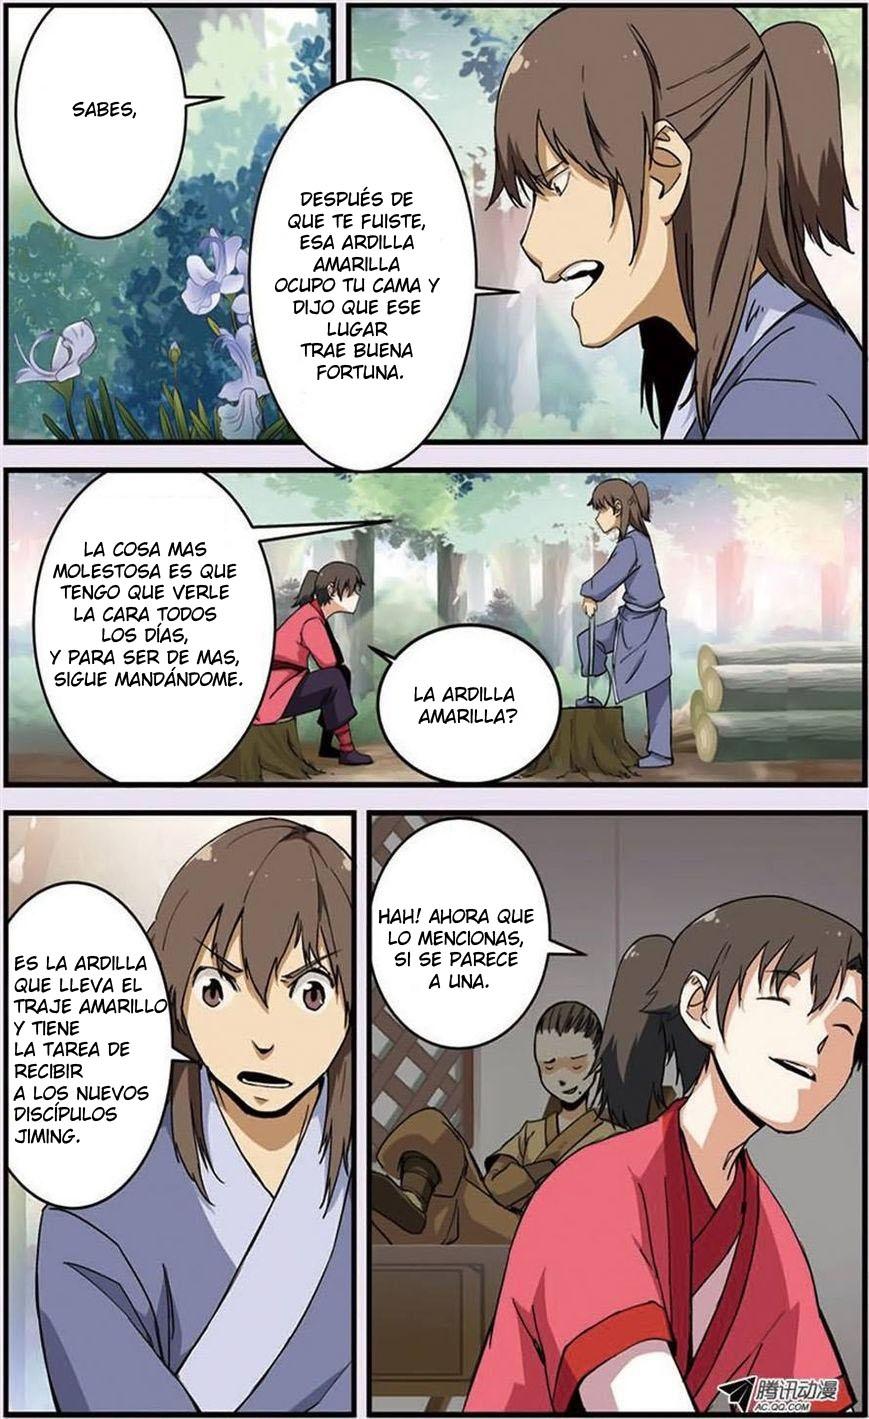 http://c5.ninemanga.com/es_manga/45/16237/390964/d9beb34eaa1dba01040150173e461bbb.jpg Page 6